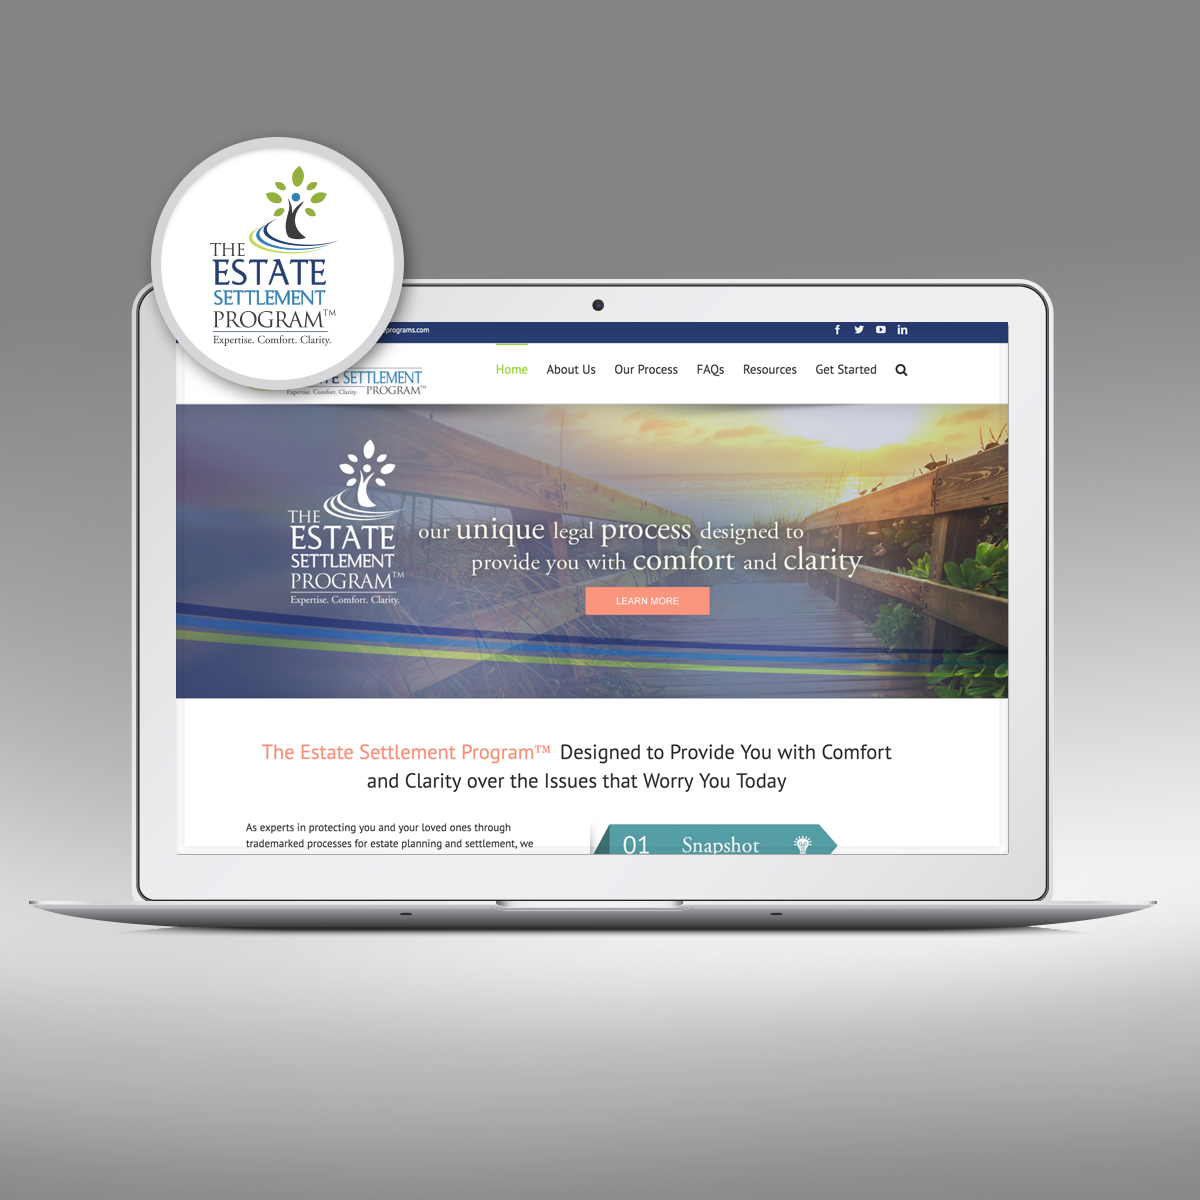 The Estate Settlement Program by Priority Marketing